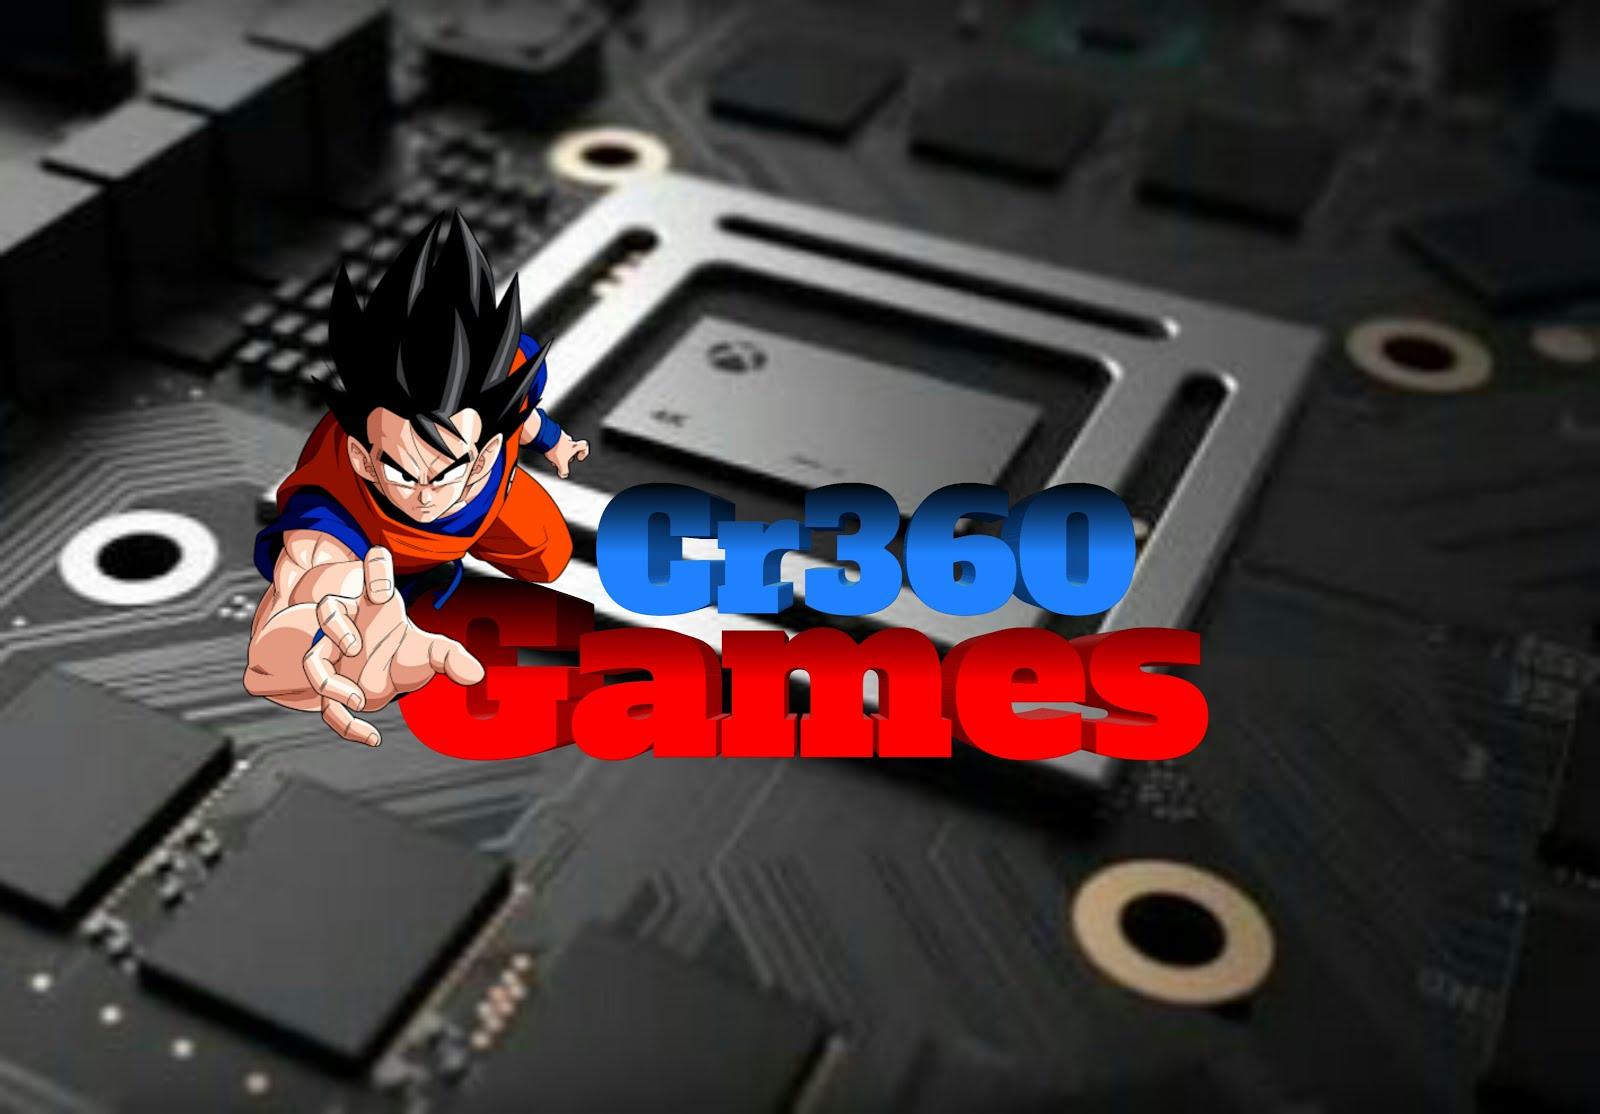 Cr360 Games